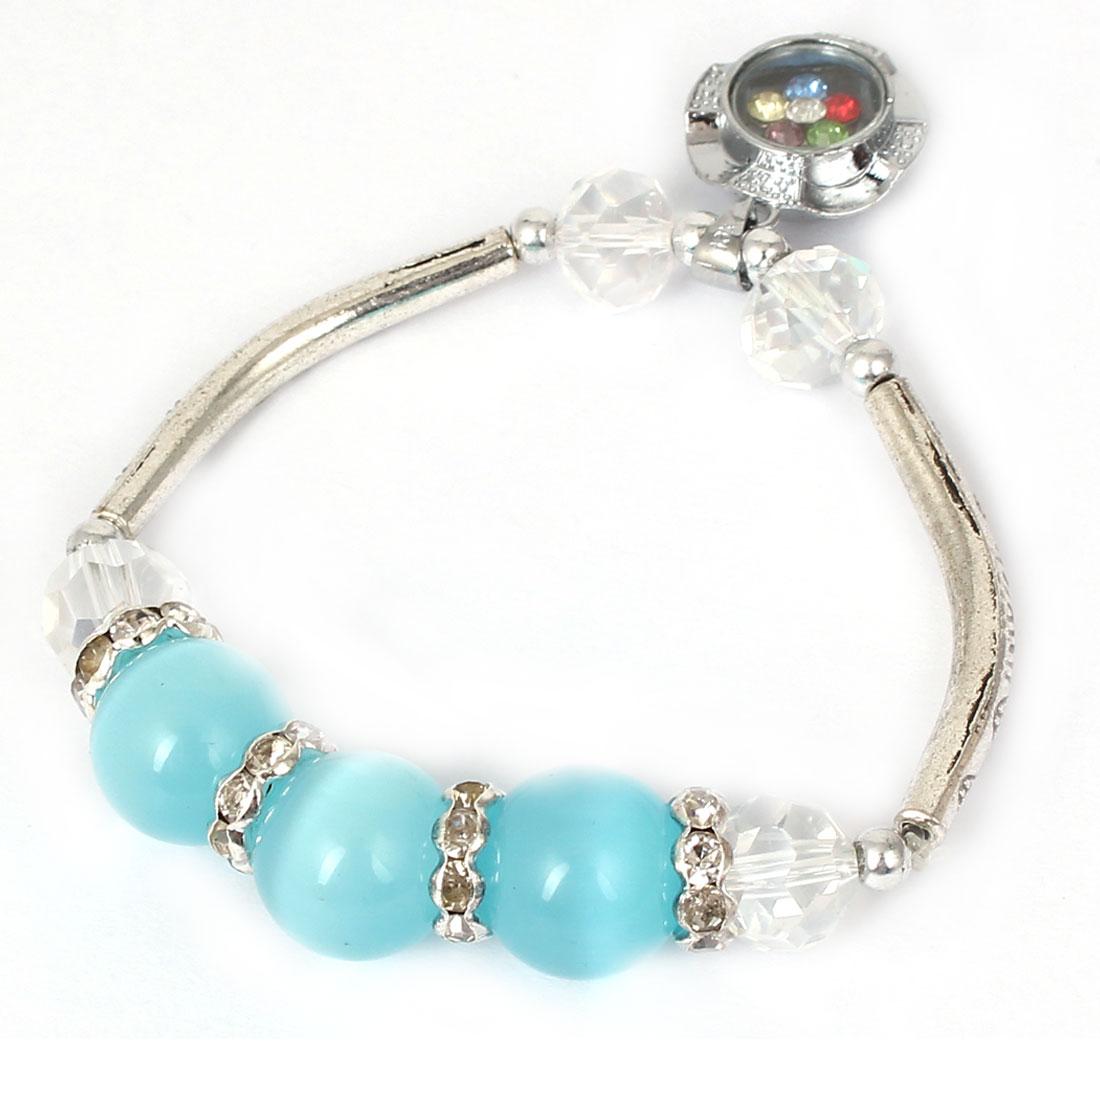 Women Faux Crystal Decor Cat Eye Round Bead Stretchy Bangle Bracelet Sky Blue